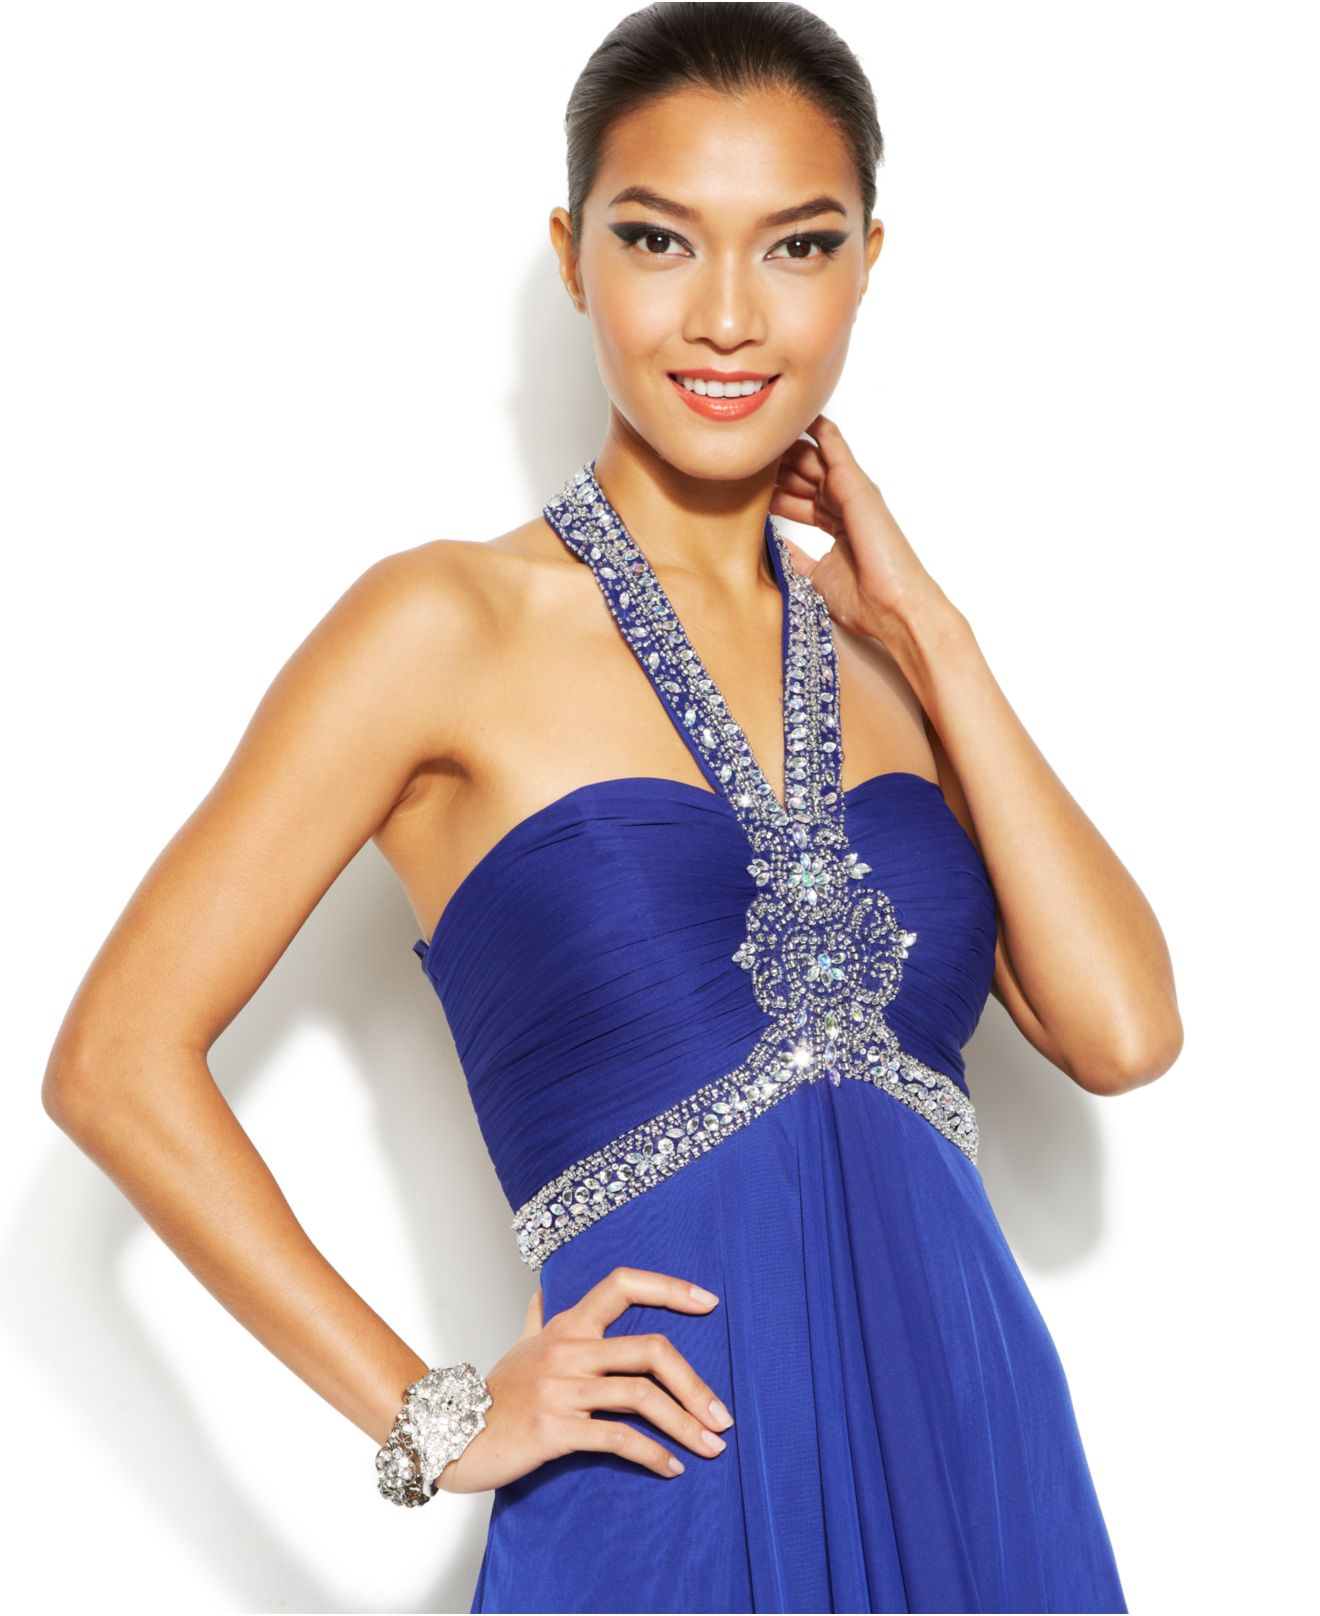 Lyst - Xscape Embellished Flyaway Halter Gown in Blue